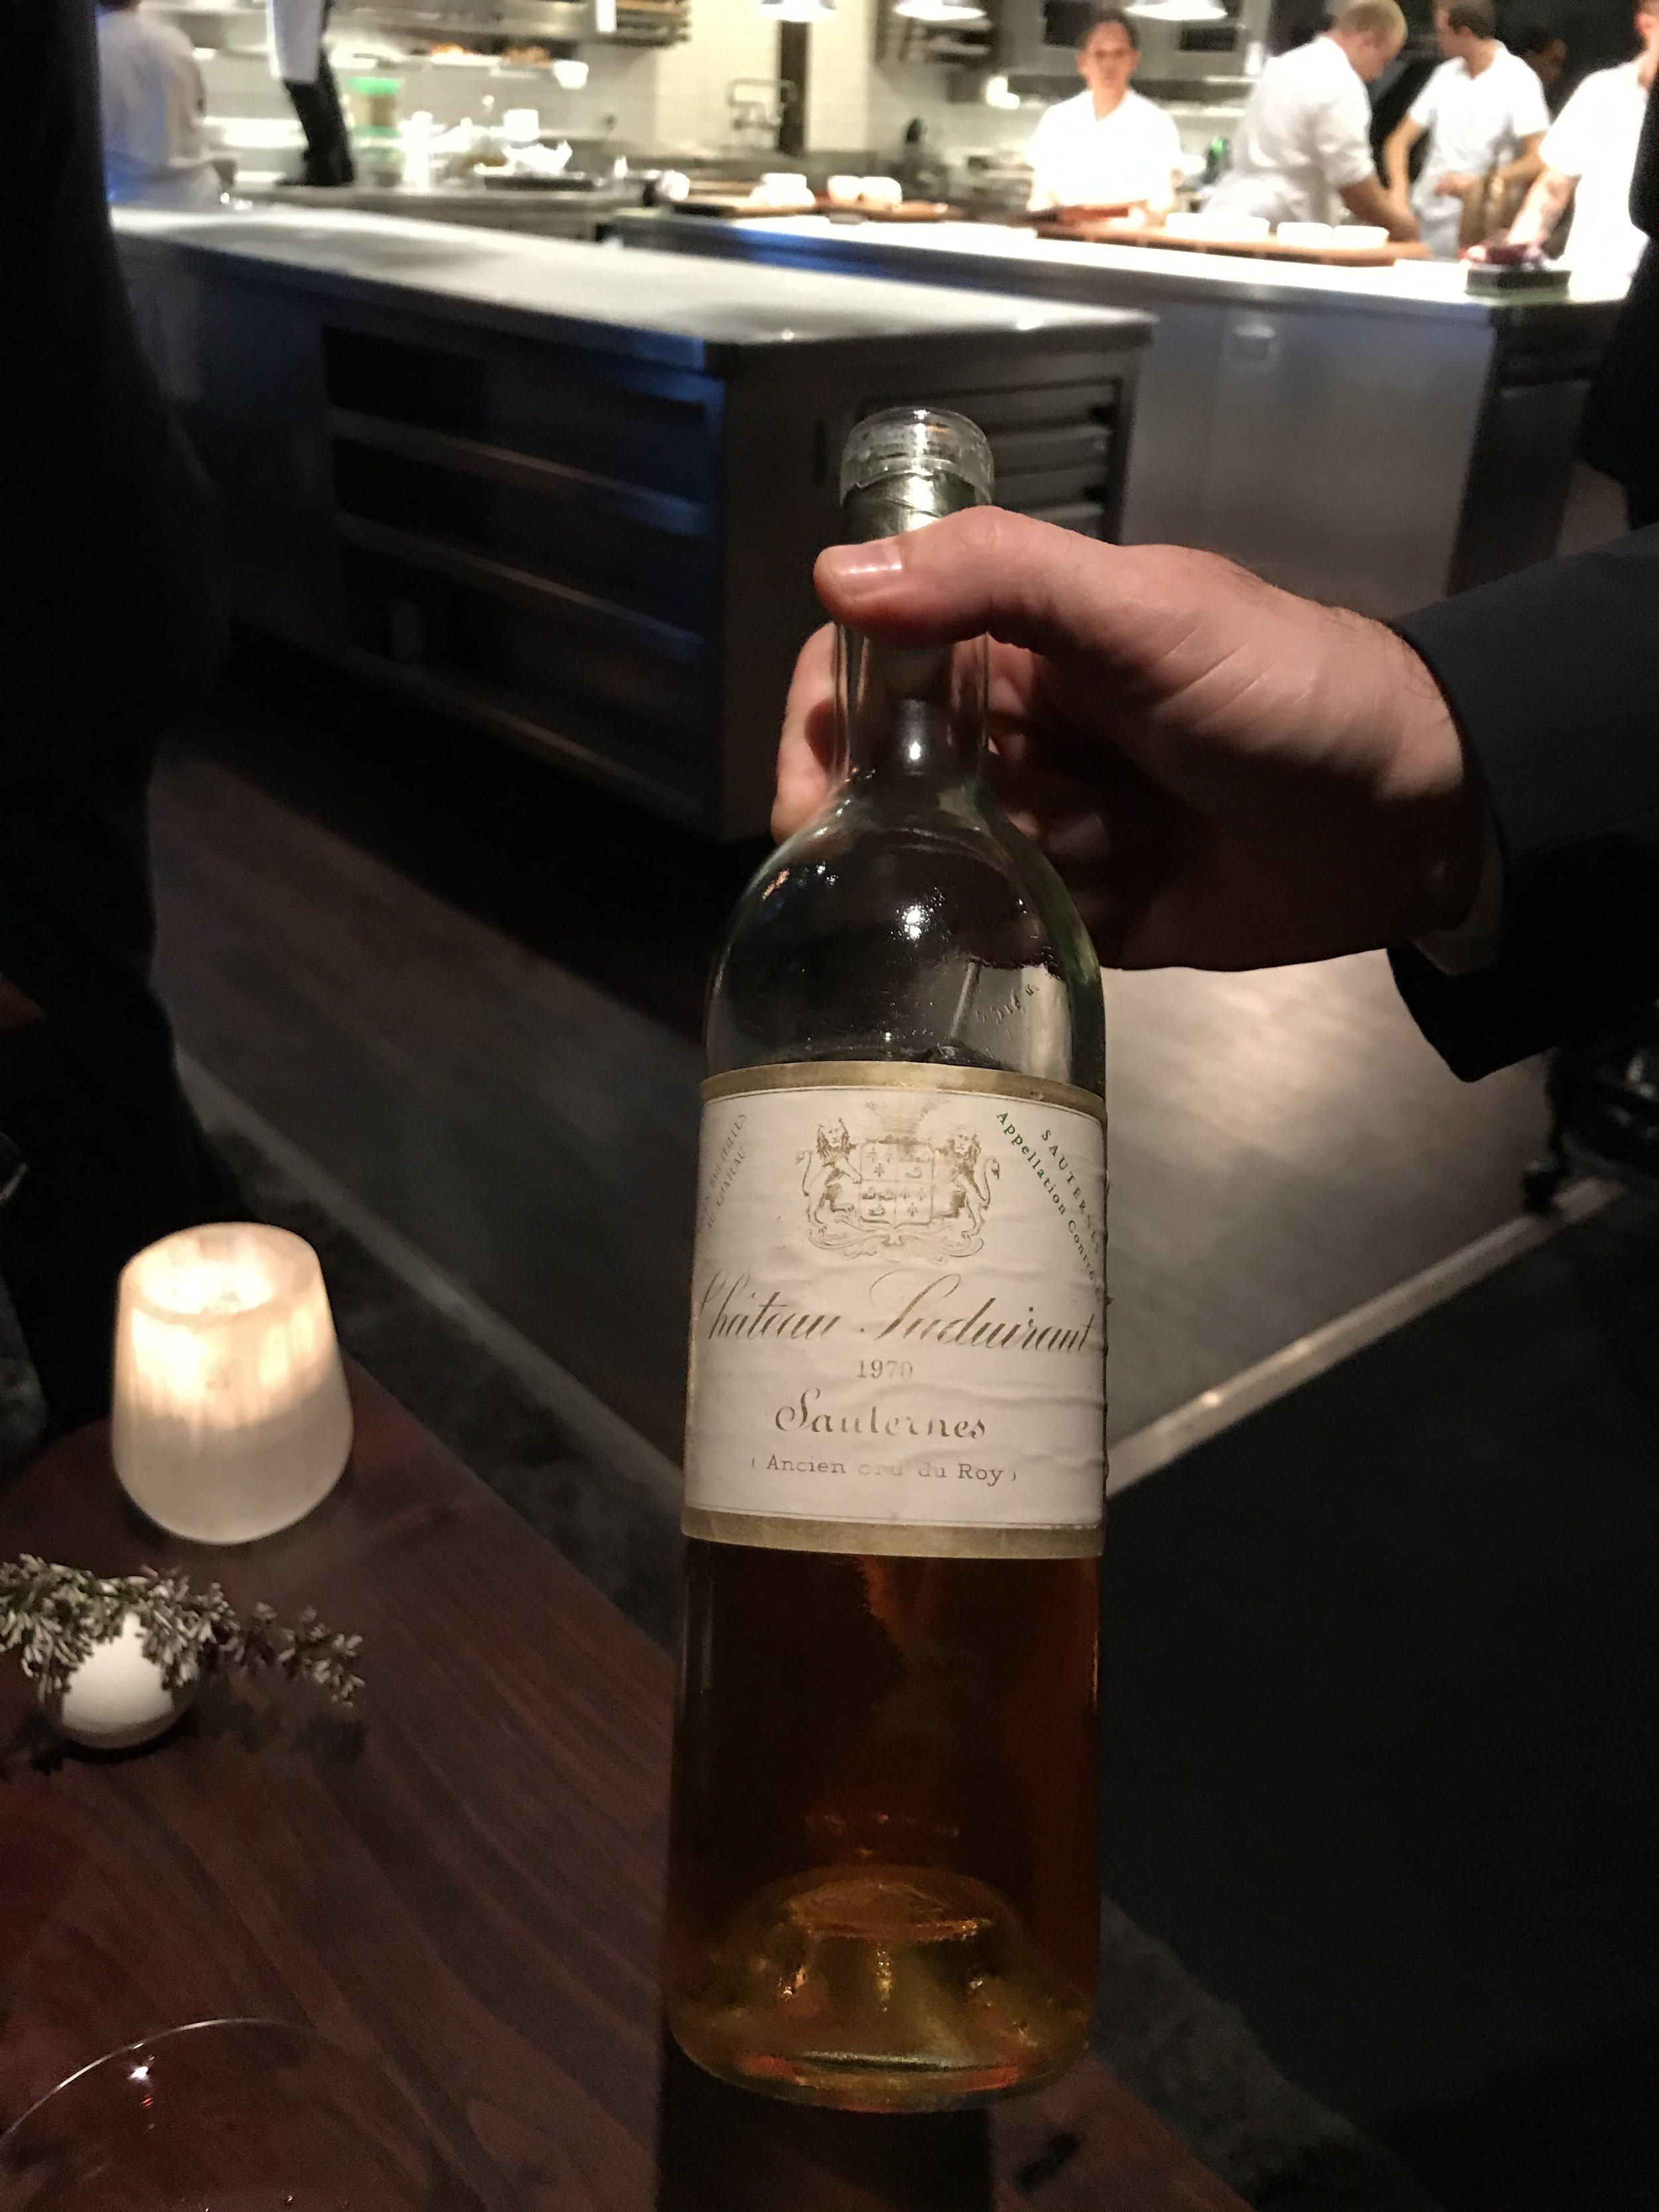 1970 Sauternes dessert wine